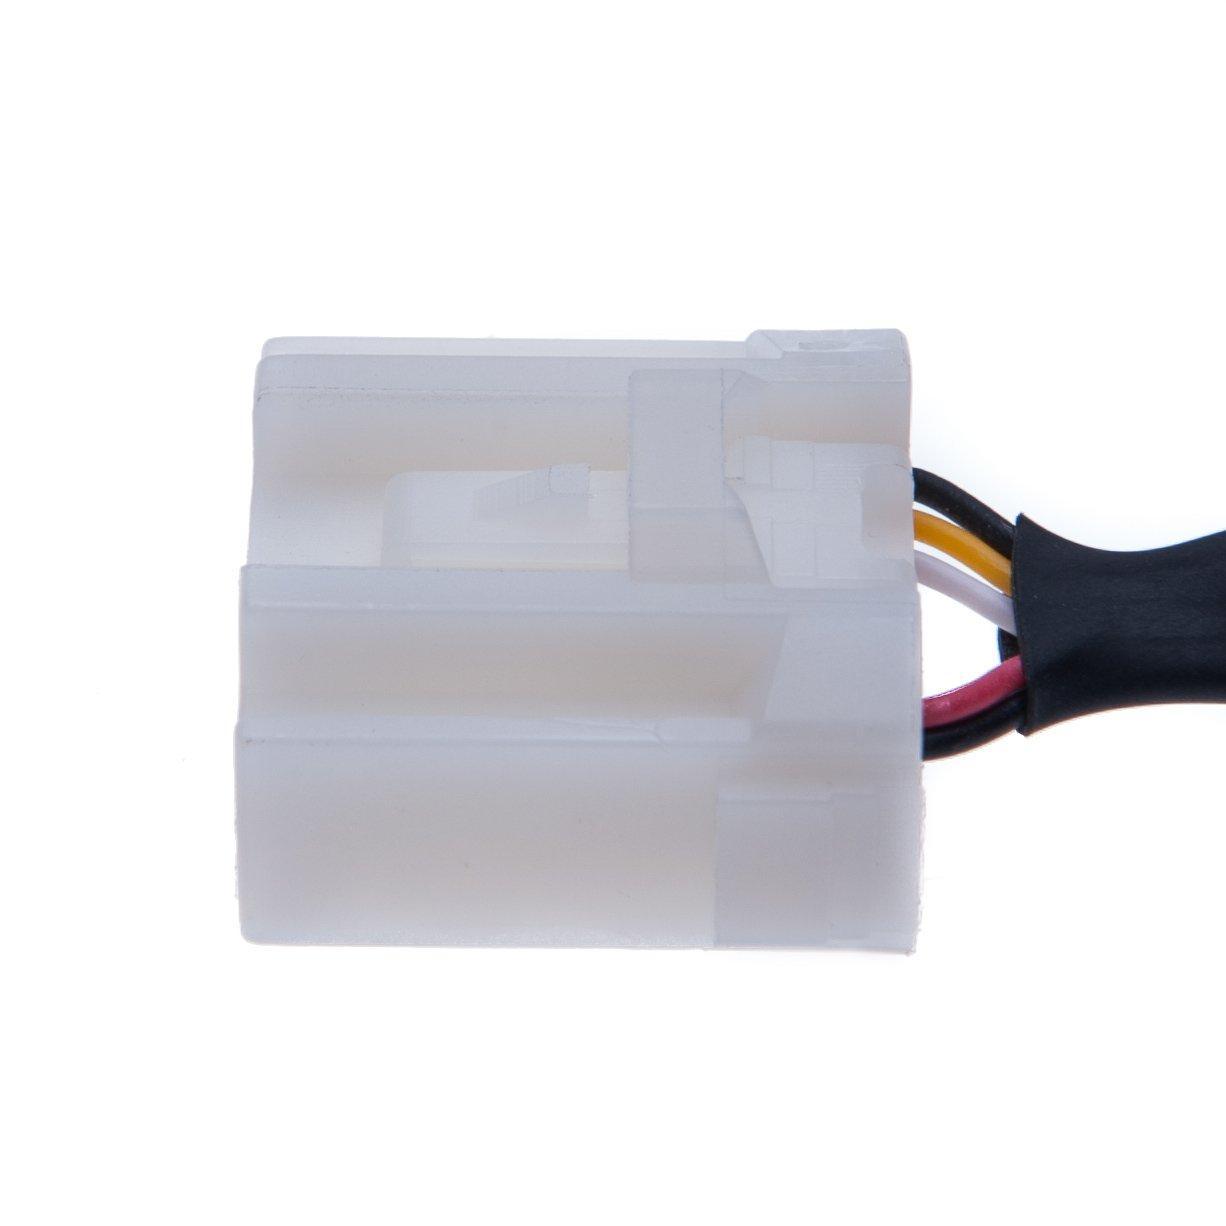 Keple Mazda m/úsica interfaz AUX-in 3.5/mm Lead adaptador MP3/Cable para conectar tel/éfono//reproductor de mp3/con votre coche Mazda RX8/2006/-2013